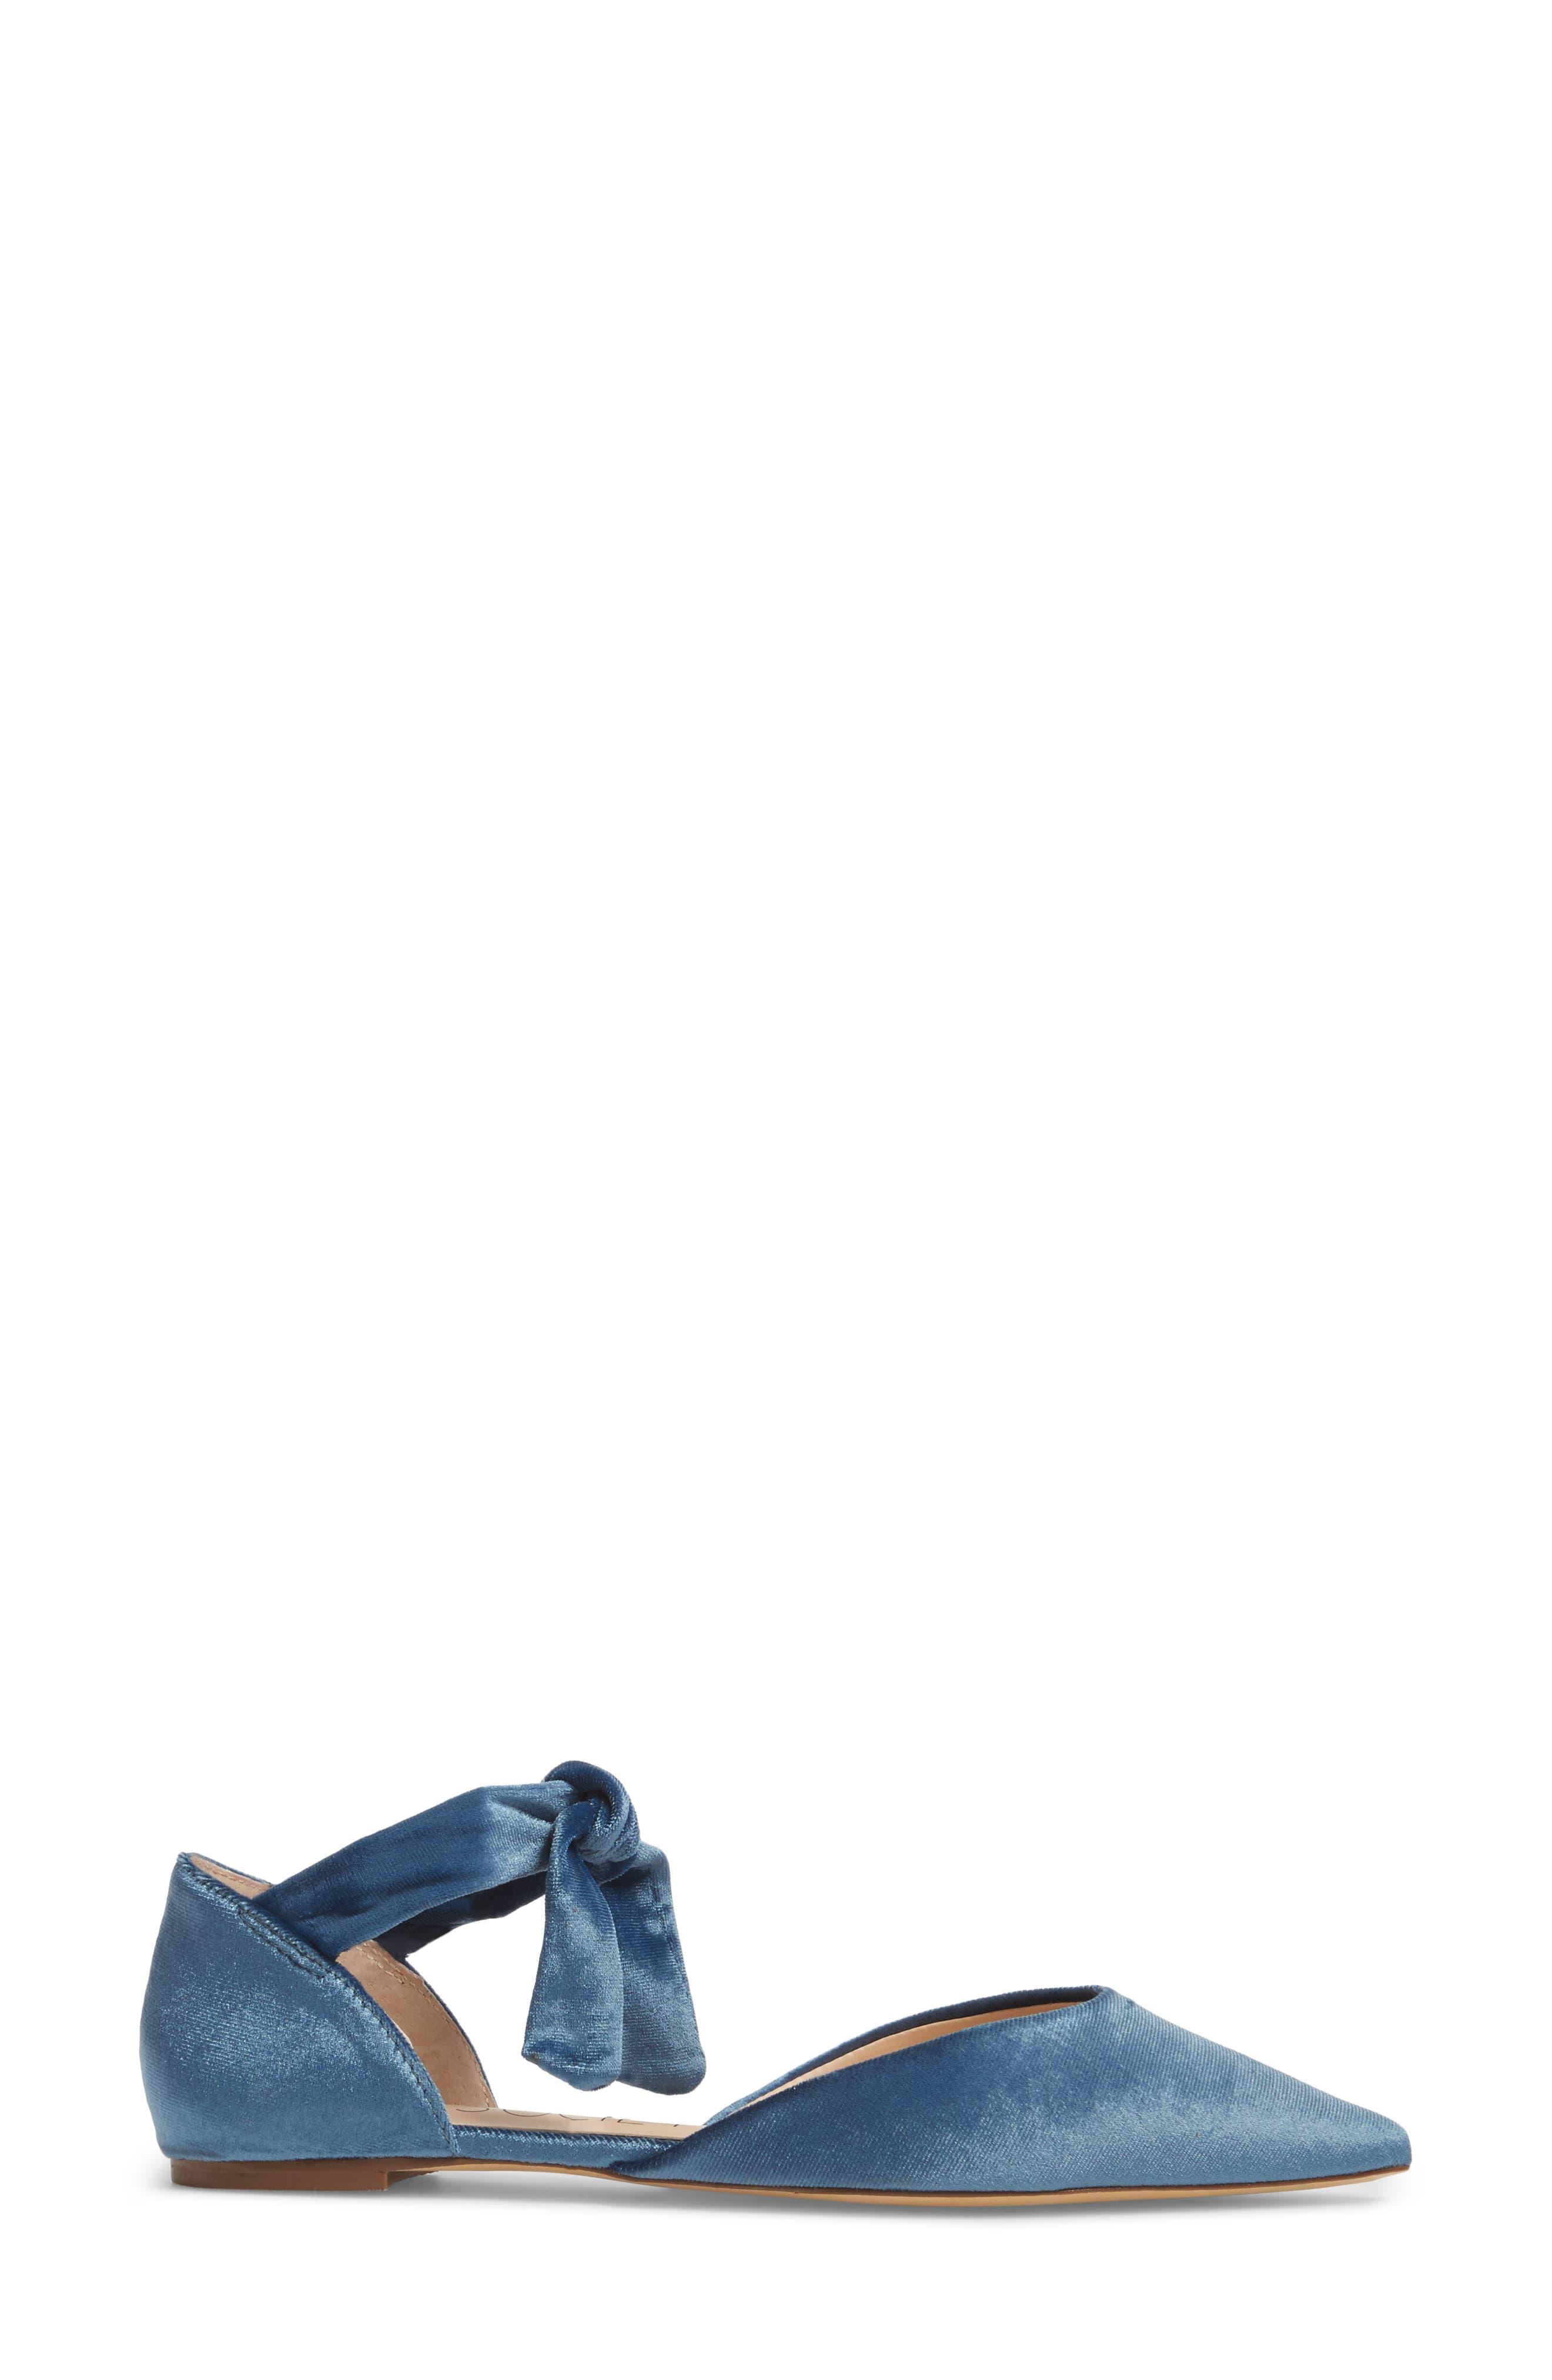 Teena d'Orsay Flat with Ties,                             Alternate thumbnail 3, color,                             Glacier Blue